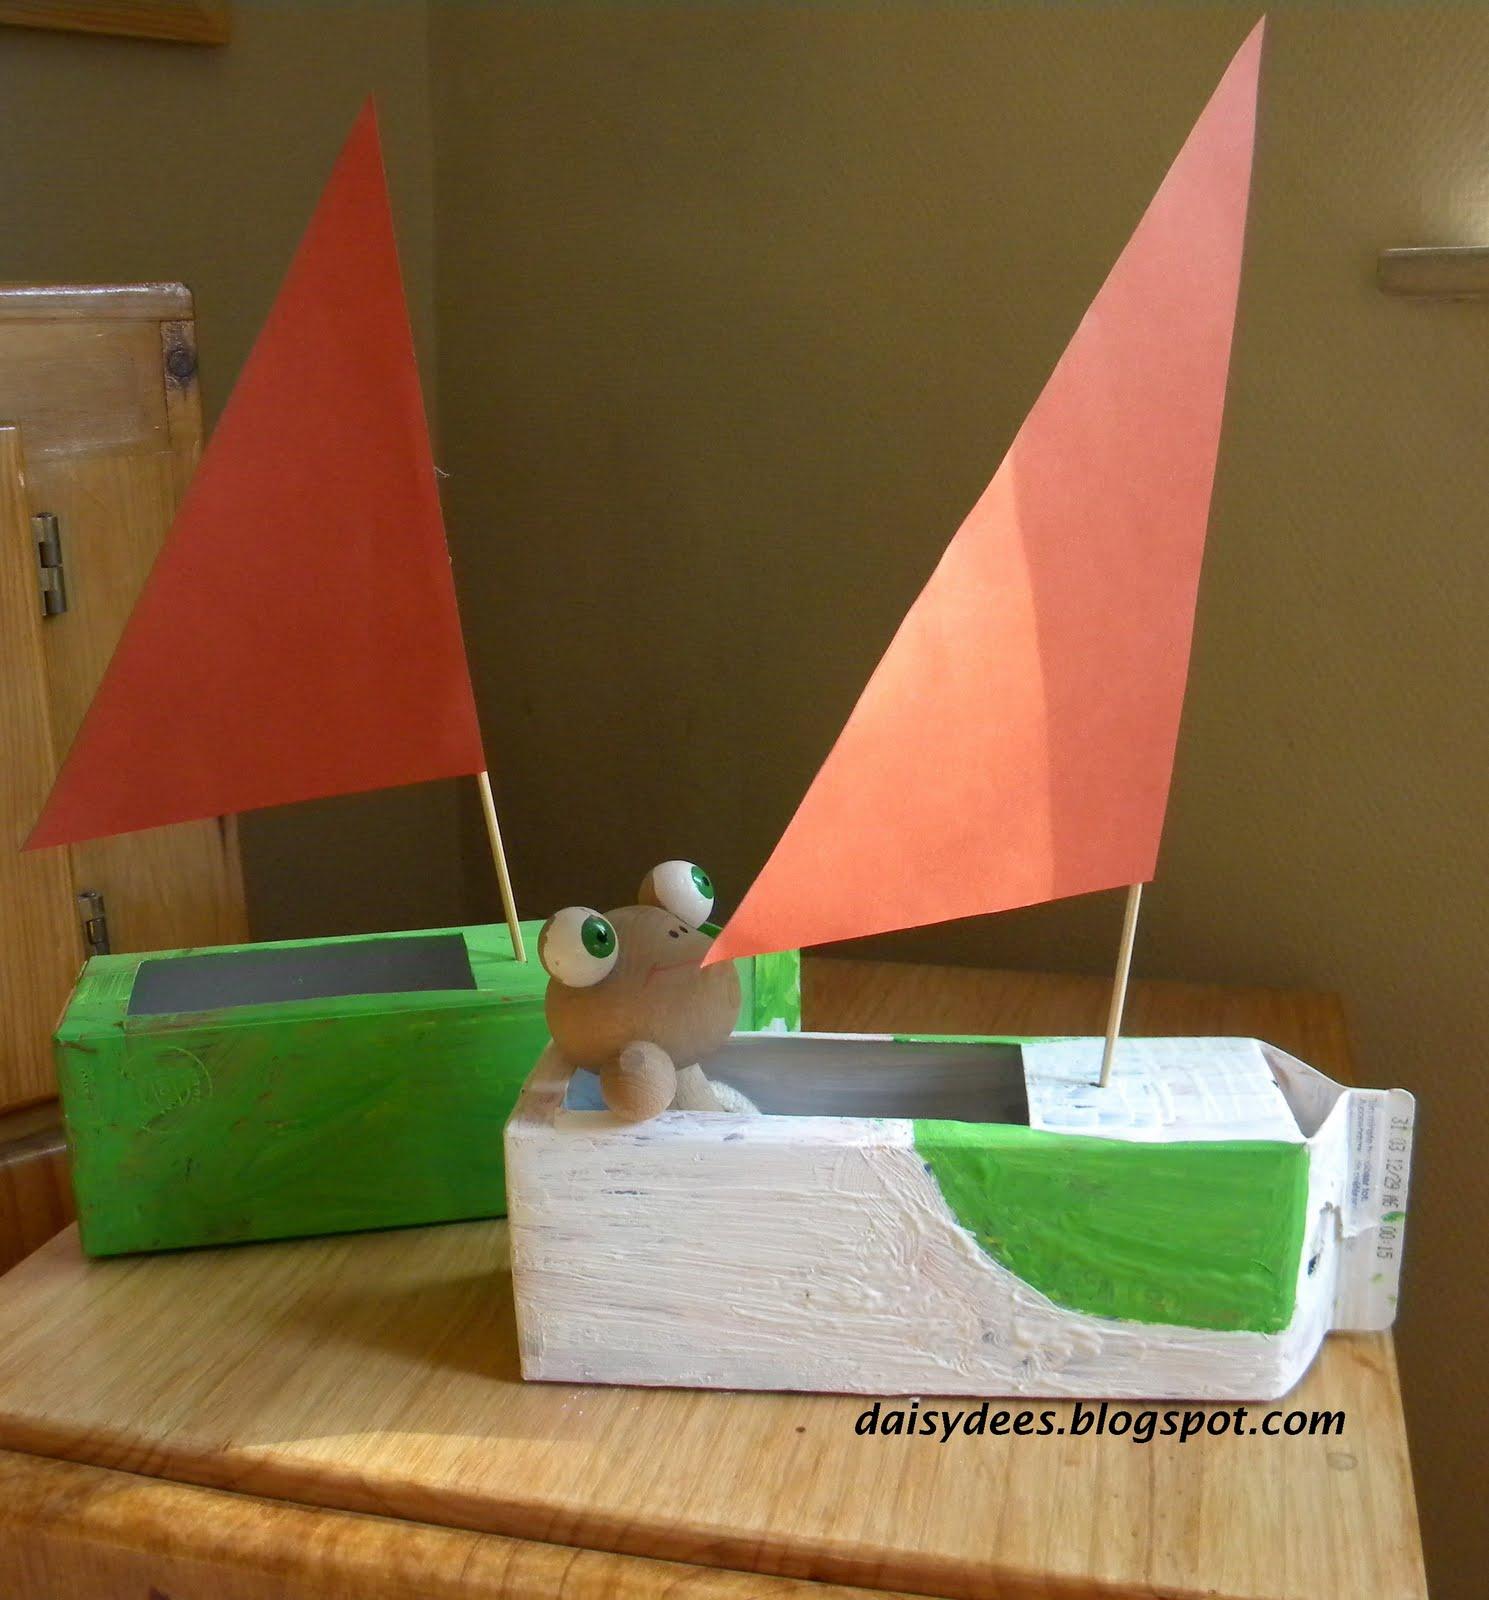 daisyd u00e9es  que faire avec des bo u00eetes de jus    u2013 des bateaux